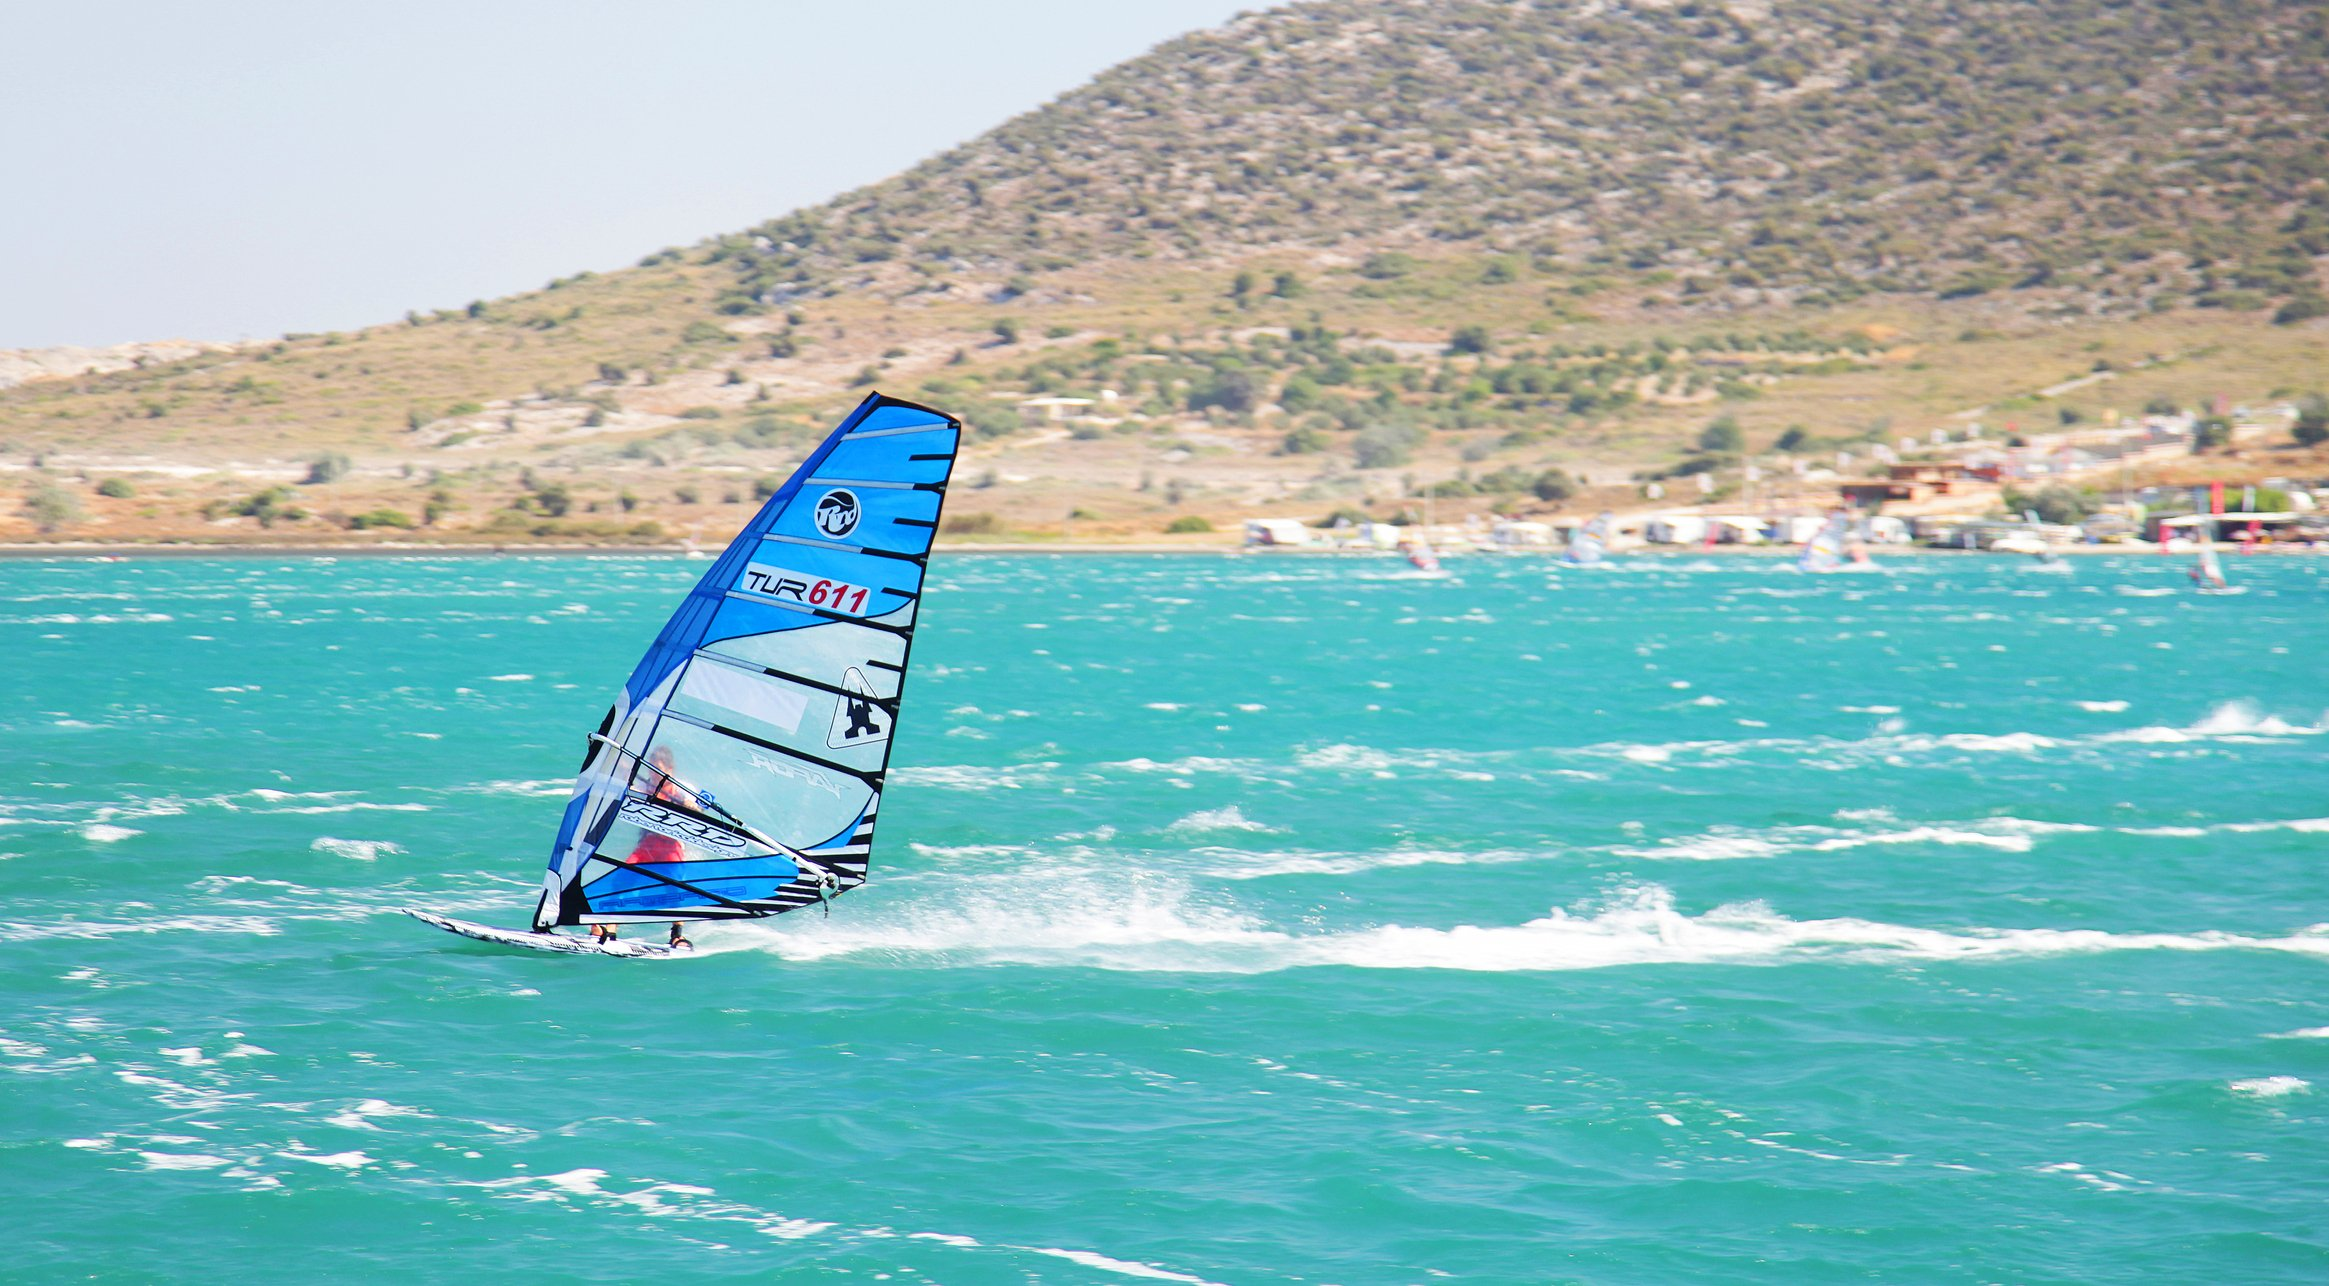 Alaçatı has been Turkey's top windsurfing destination for many years. (iStock Photo)